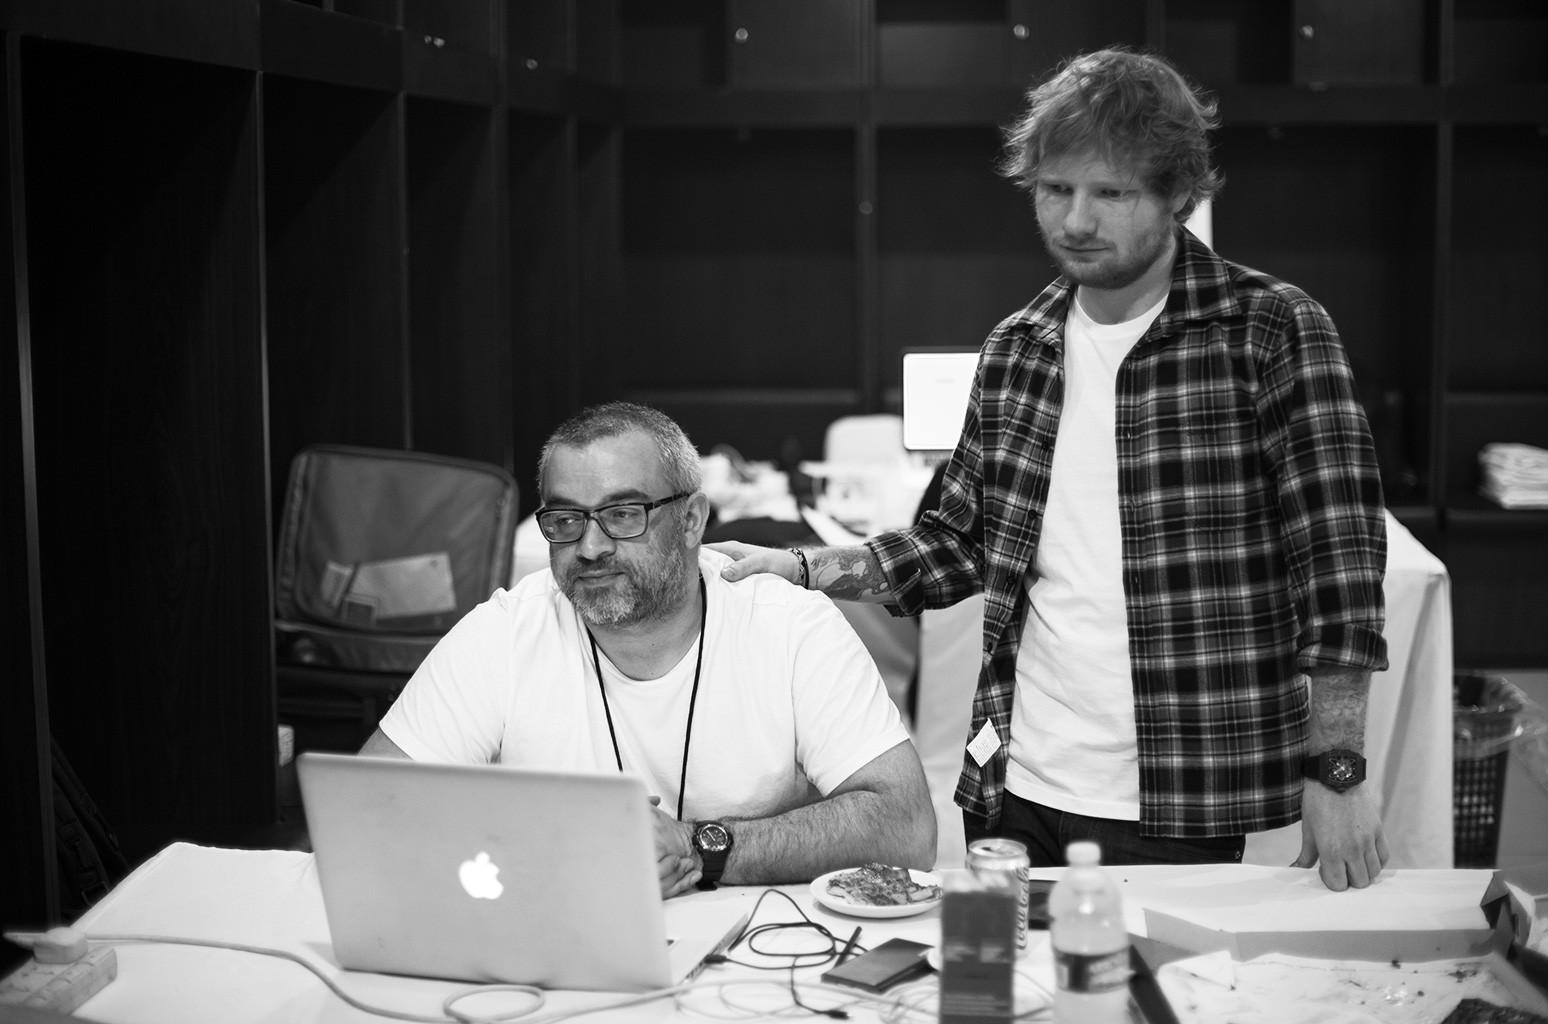 Stuart Camp and Ed Sheeran